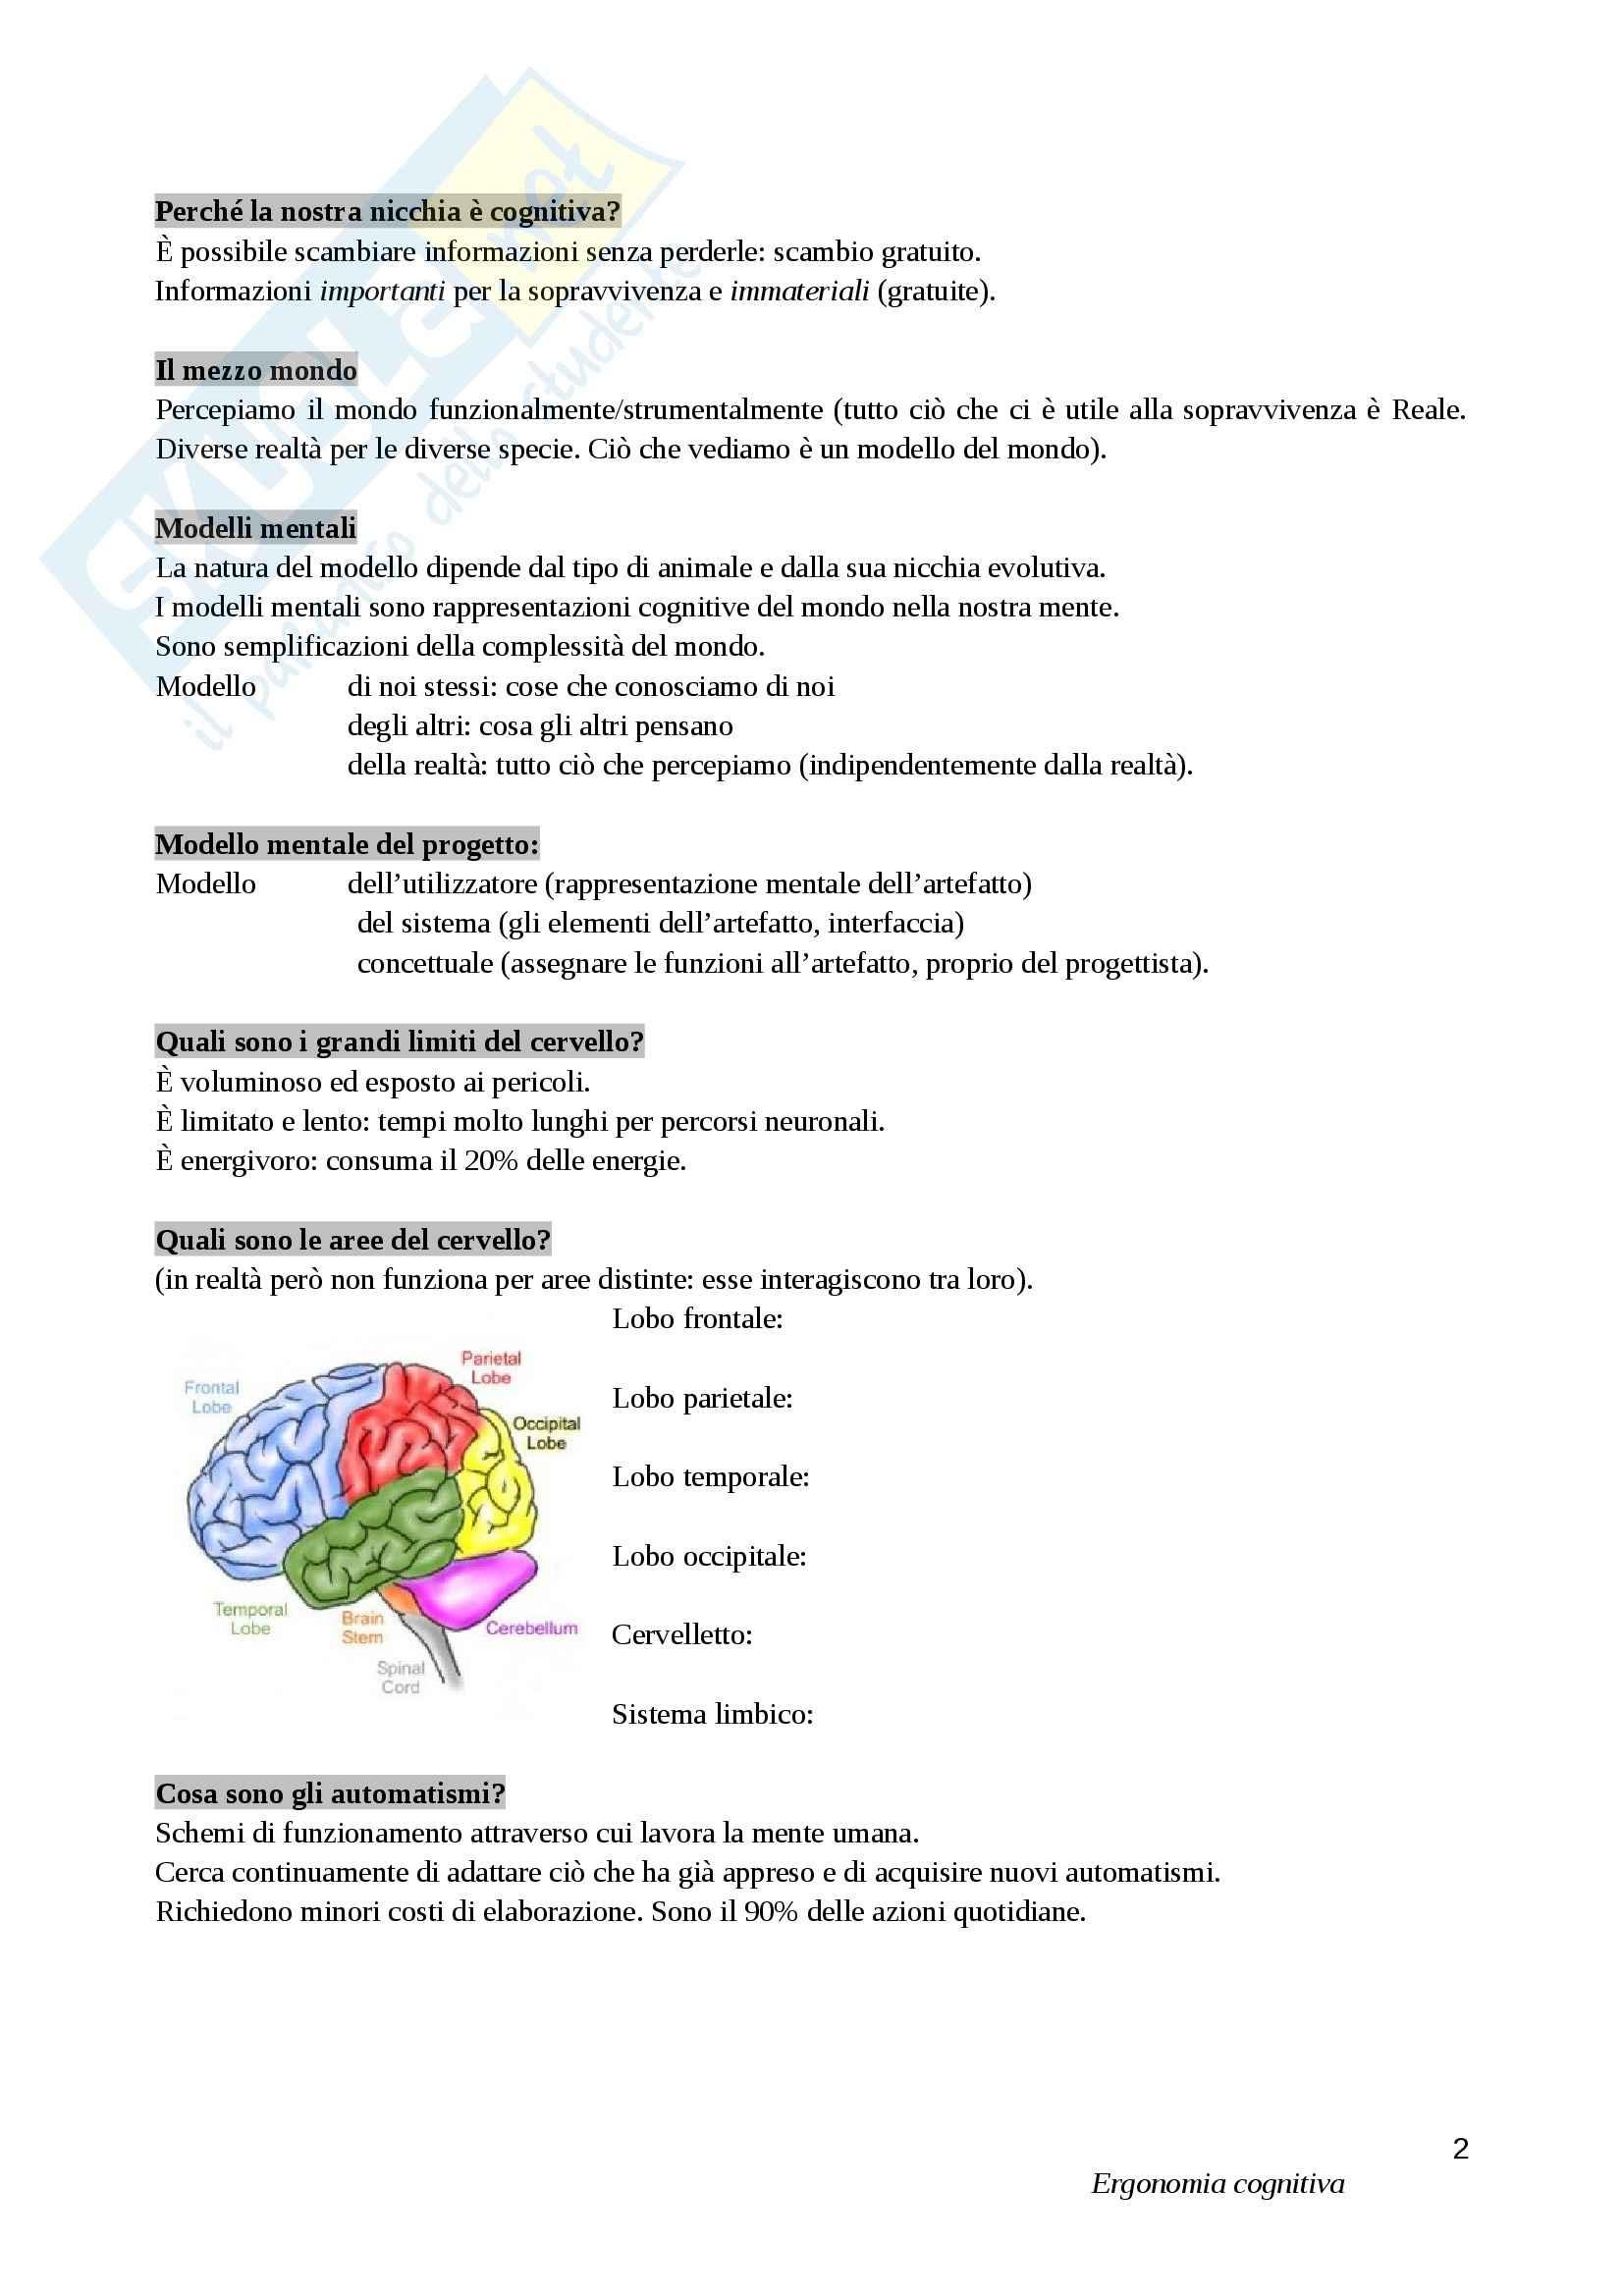 Lezioni, Ergonomia cognitiva Pag. 2